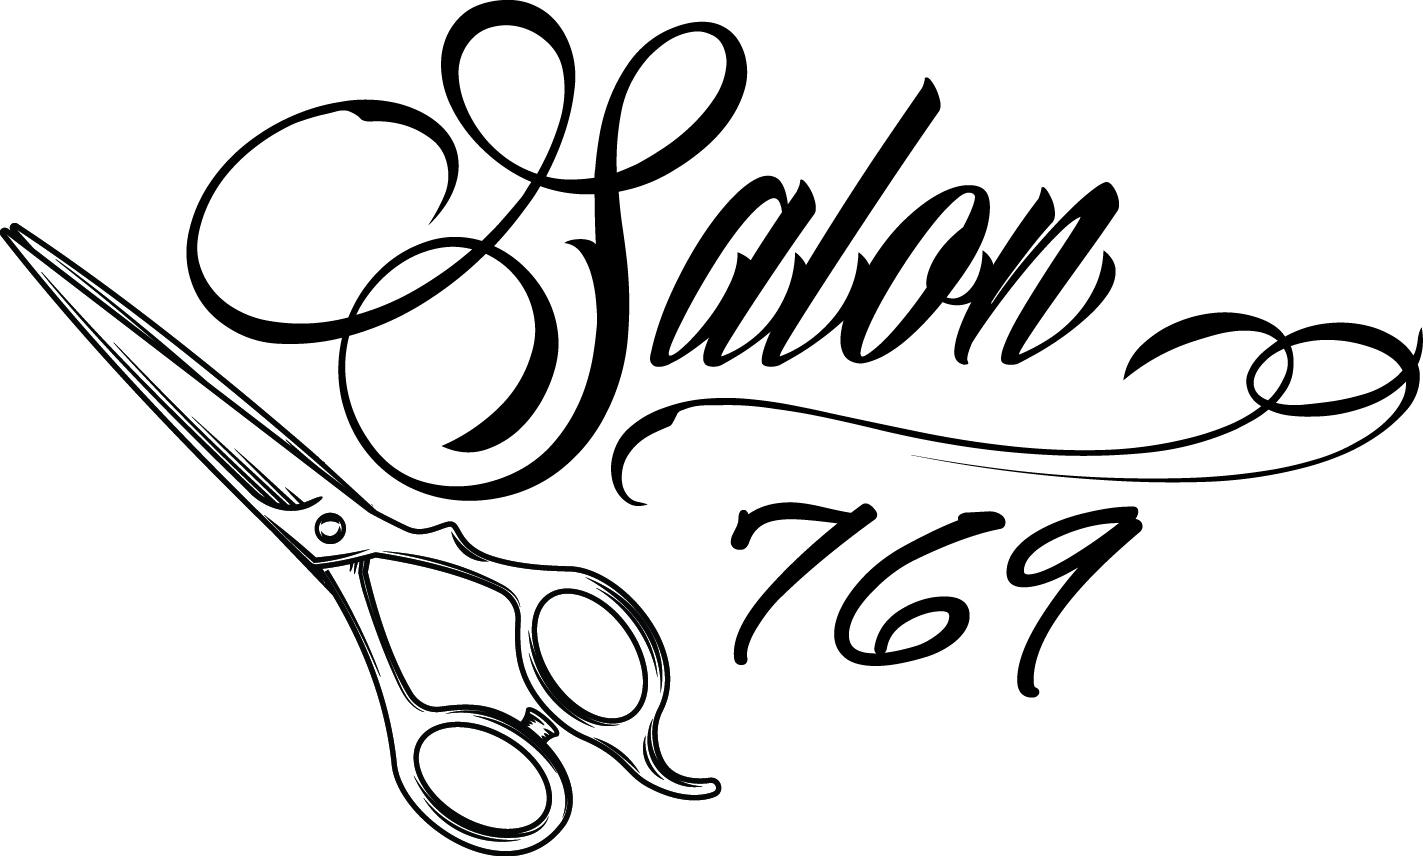 Salon769_LOGO.jpg